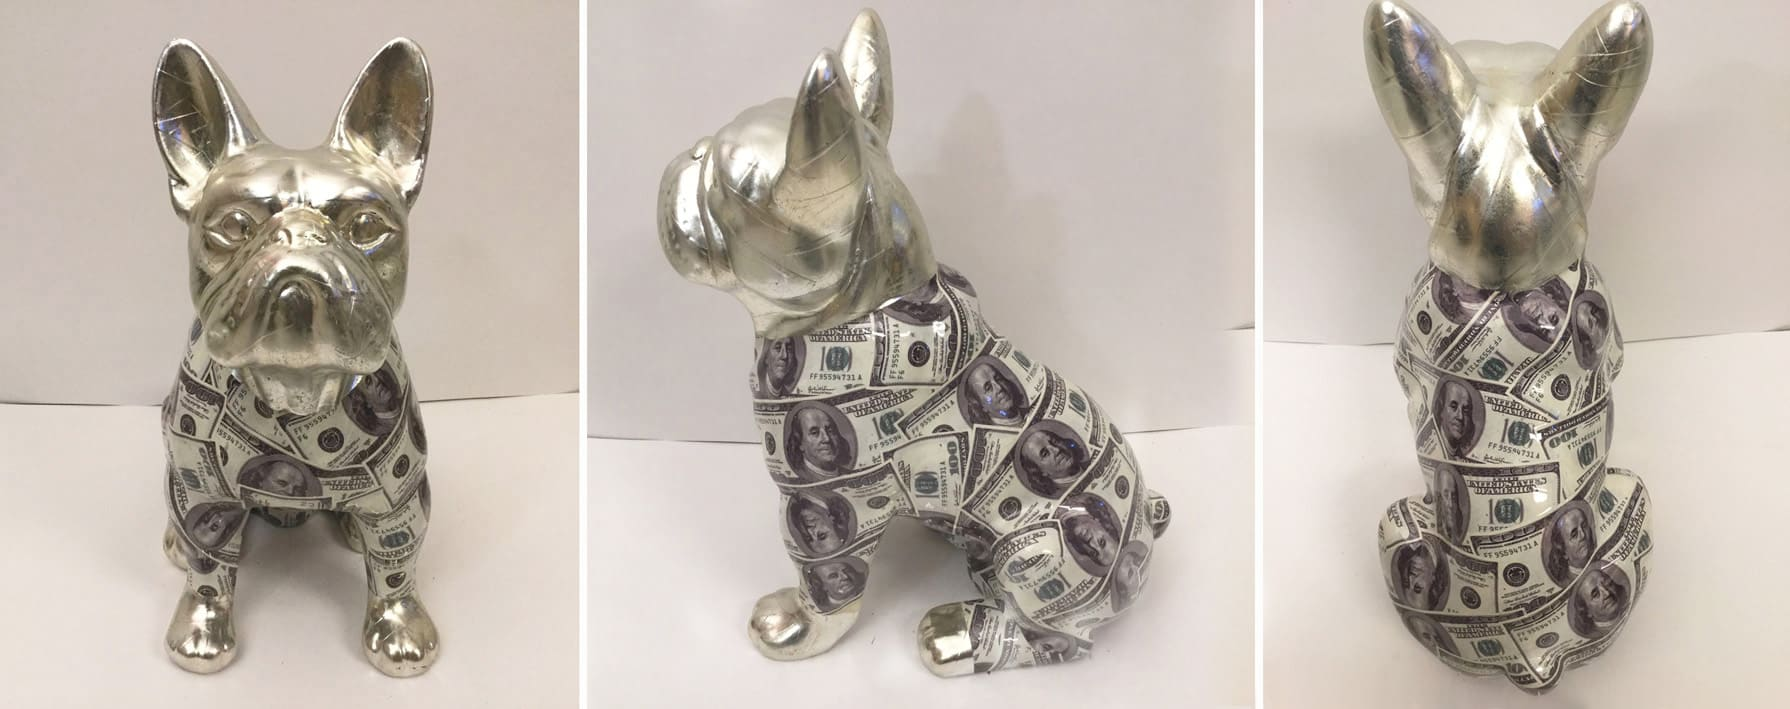 Ewa Sibilska - Silver Dollar Dog